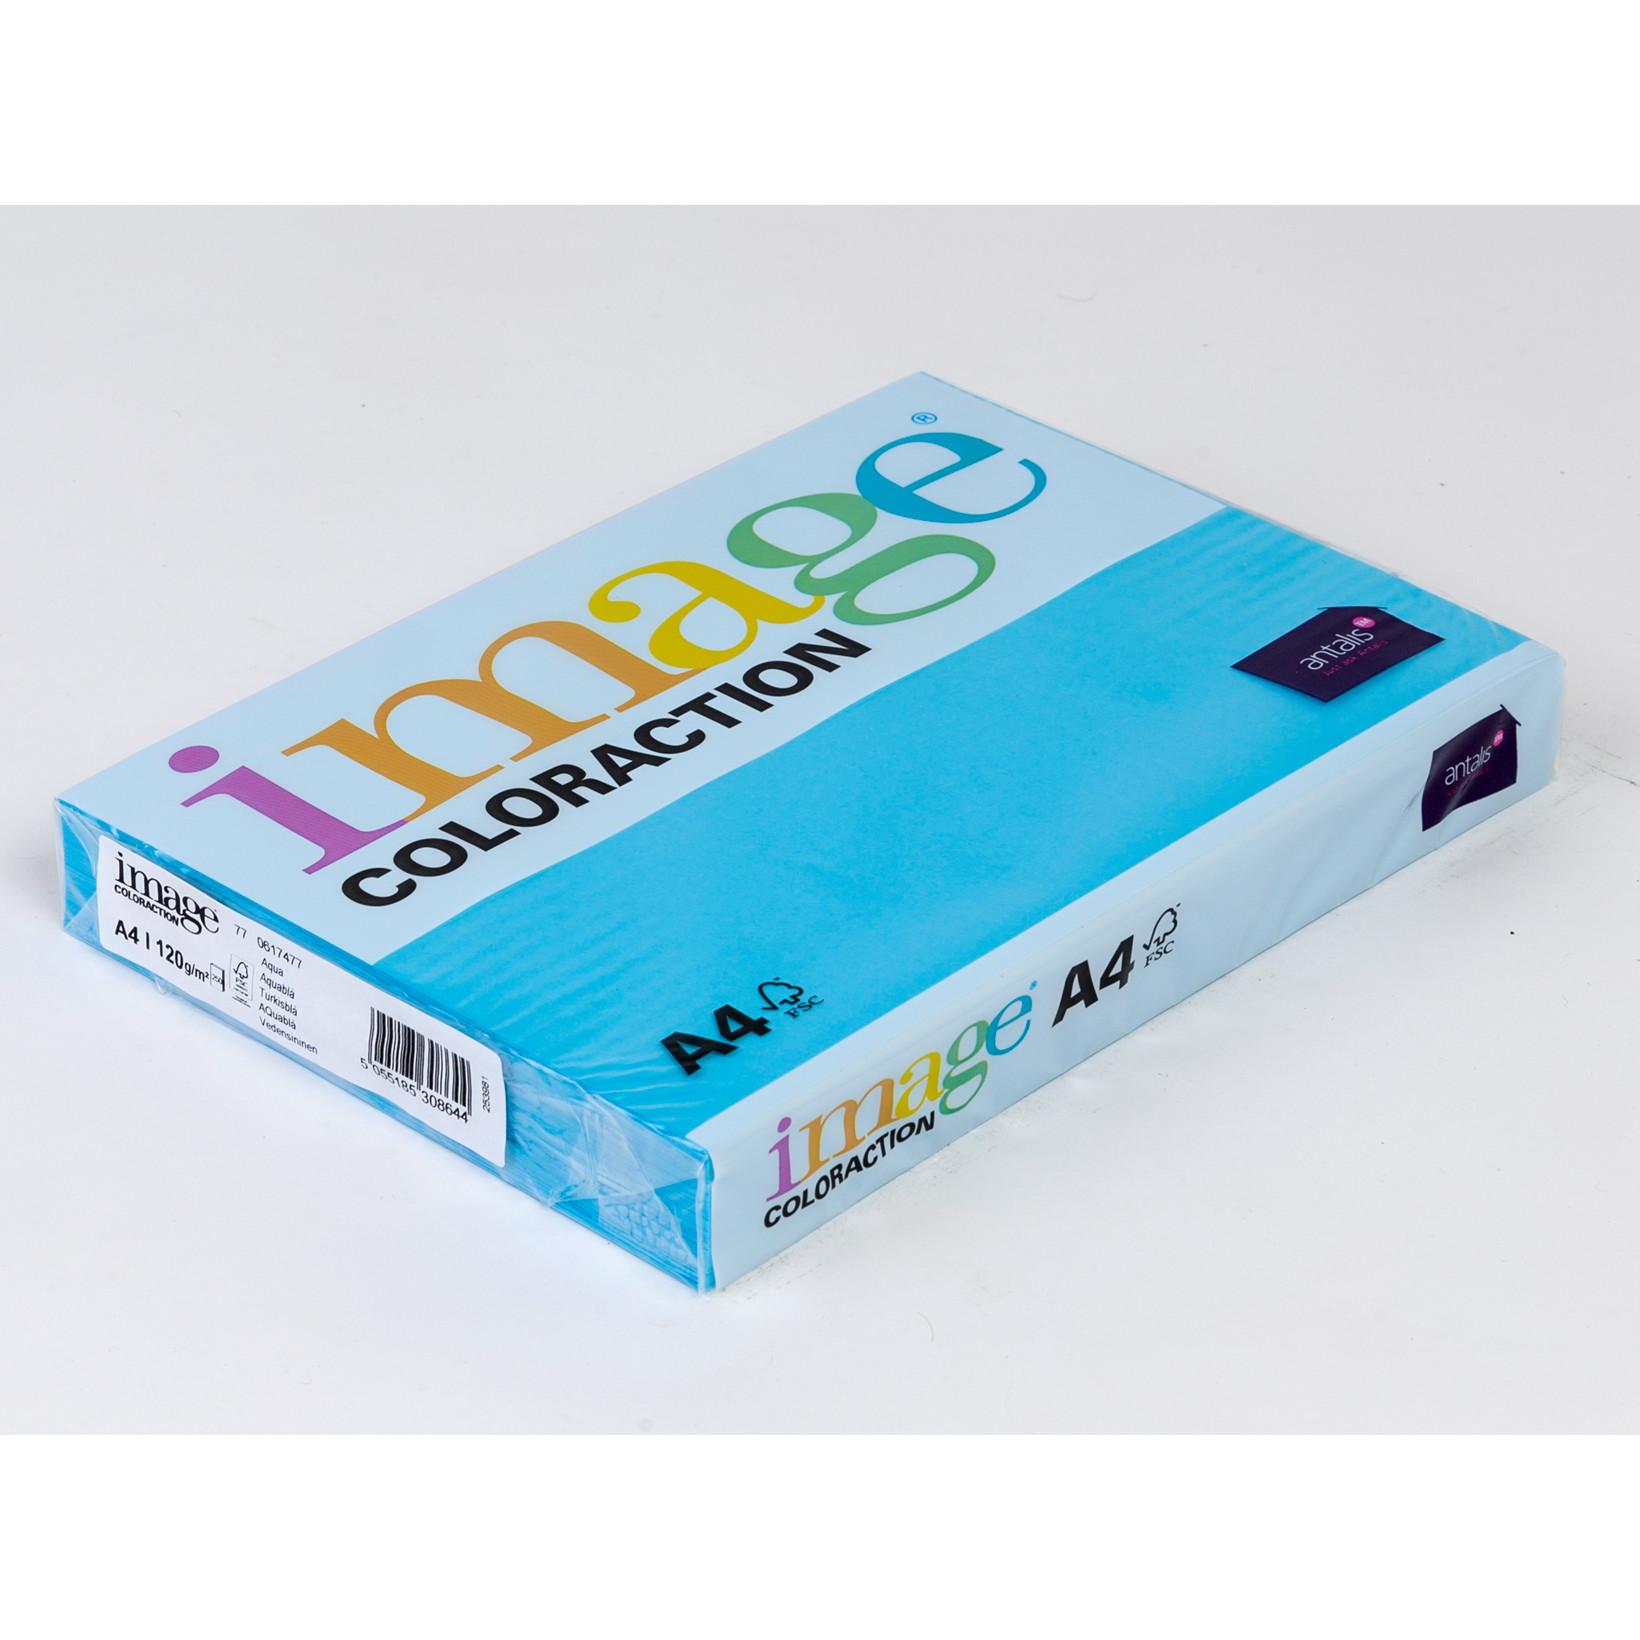 Printerpapir Image Coloraction A4 120 gram turkisblå 77 - 250 ark